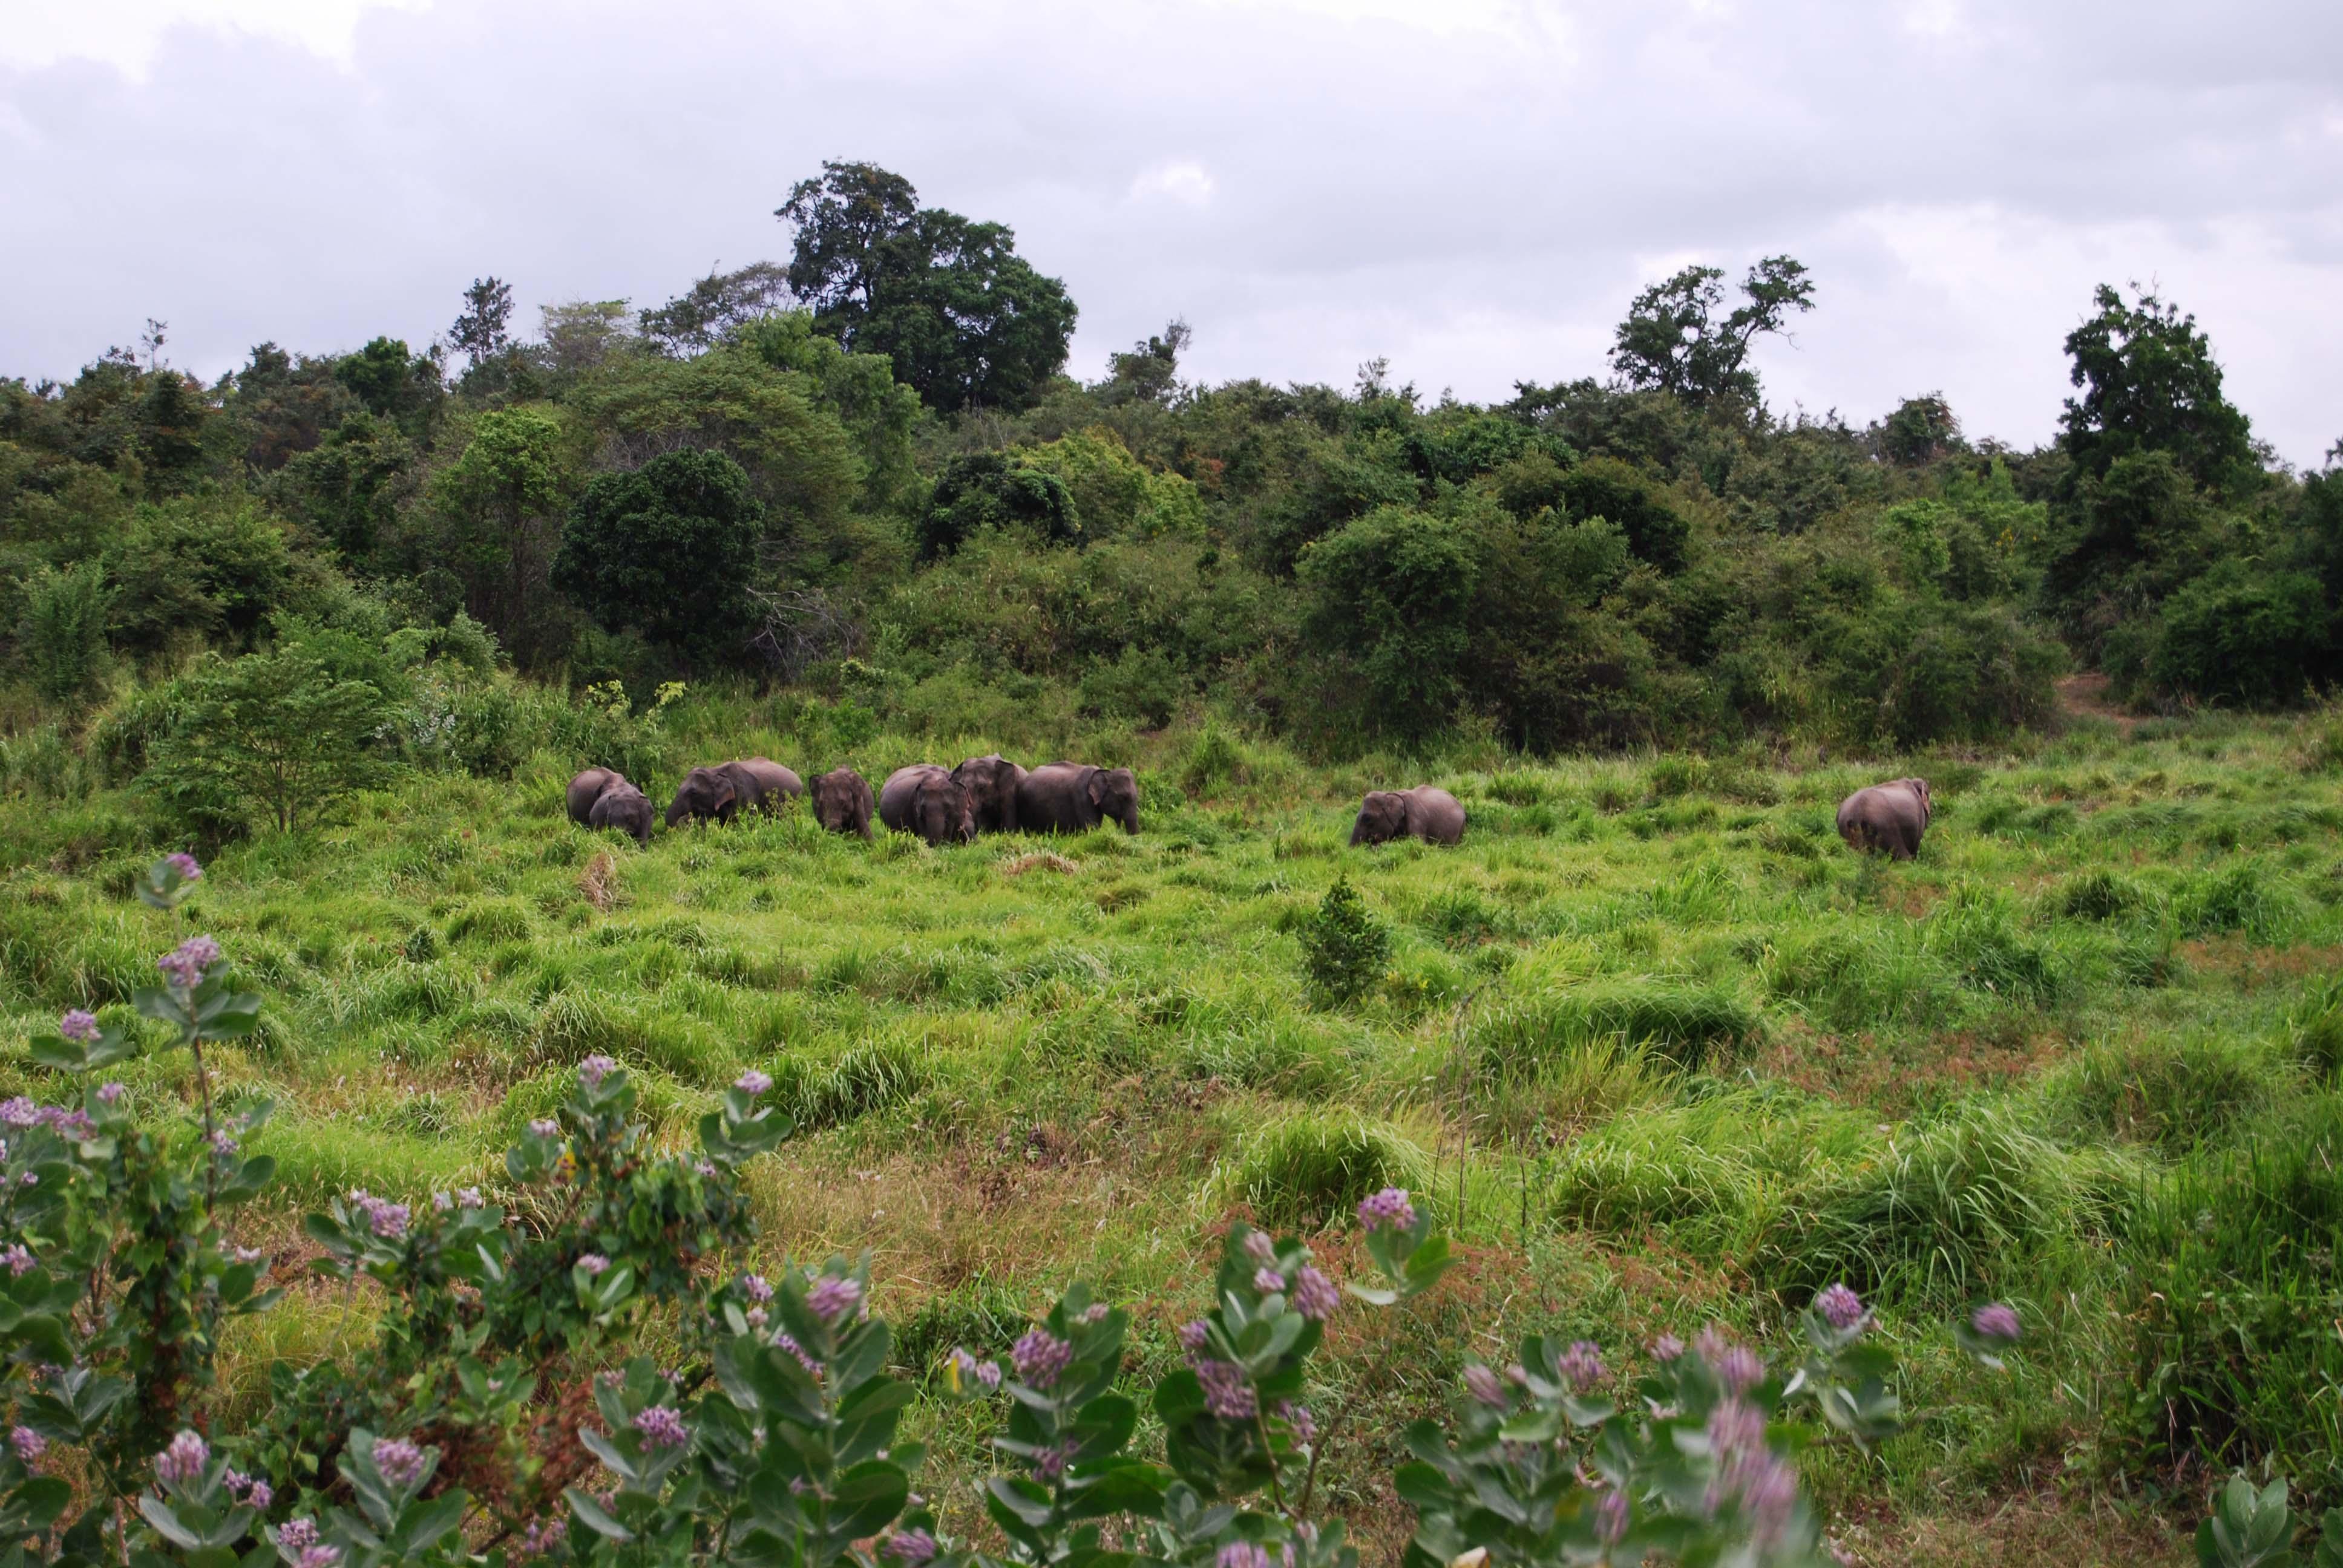 Elephant herd Sri Lanka, wild elephant